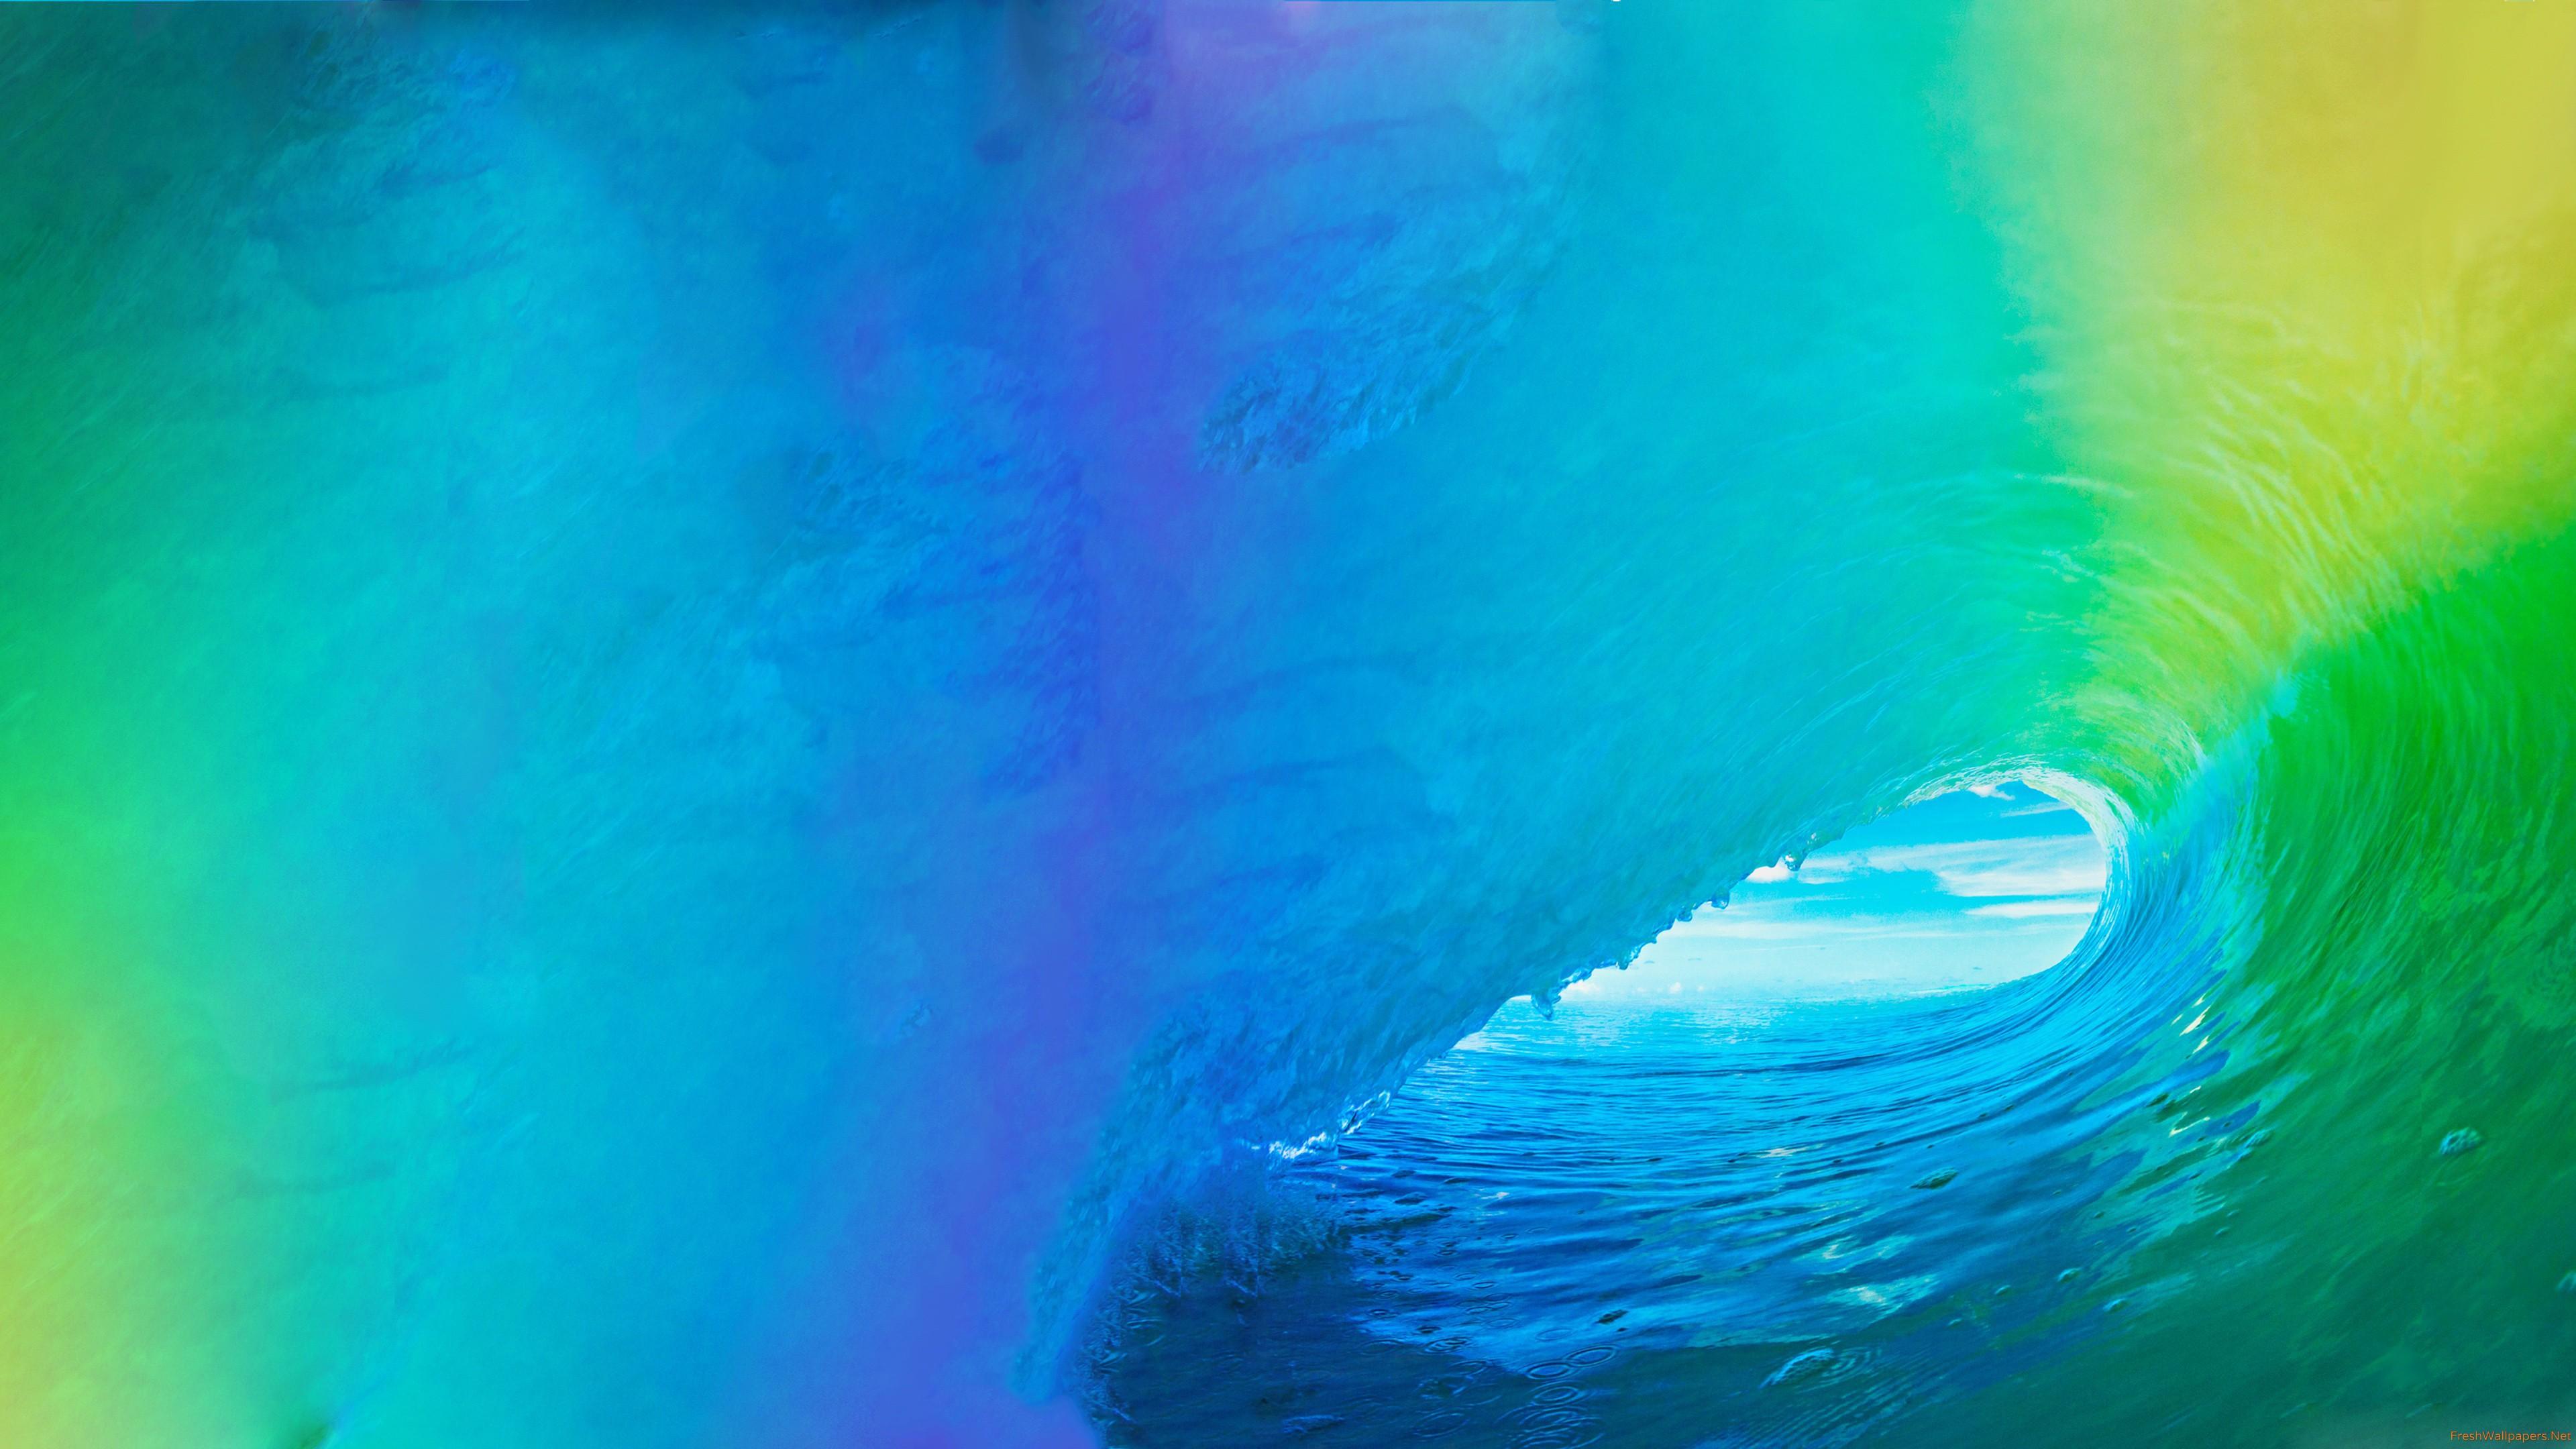 IOS 9 Space Wallpaper HD IPhone 6S 12026 Wallpaper Download HD 3840x2160